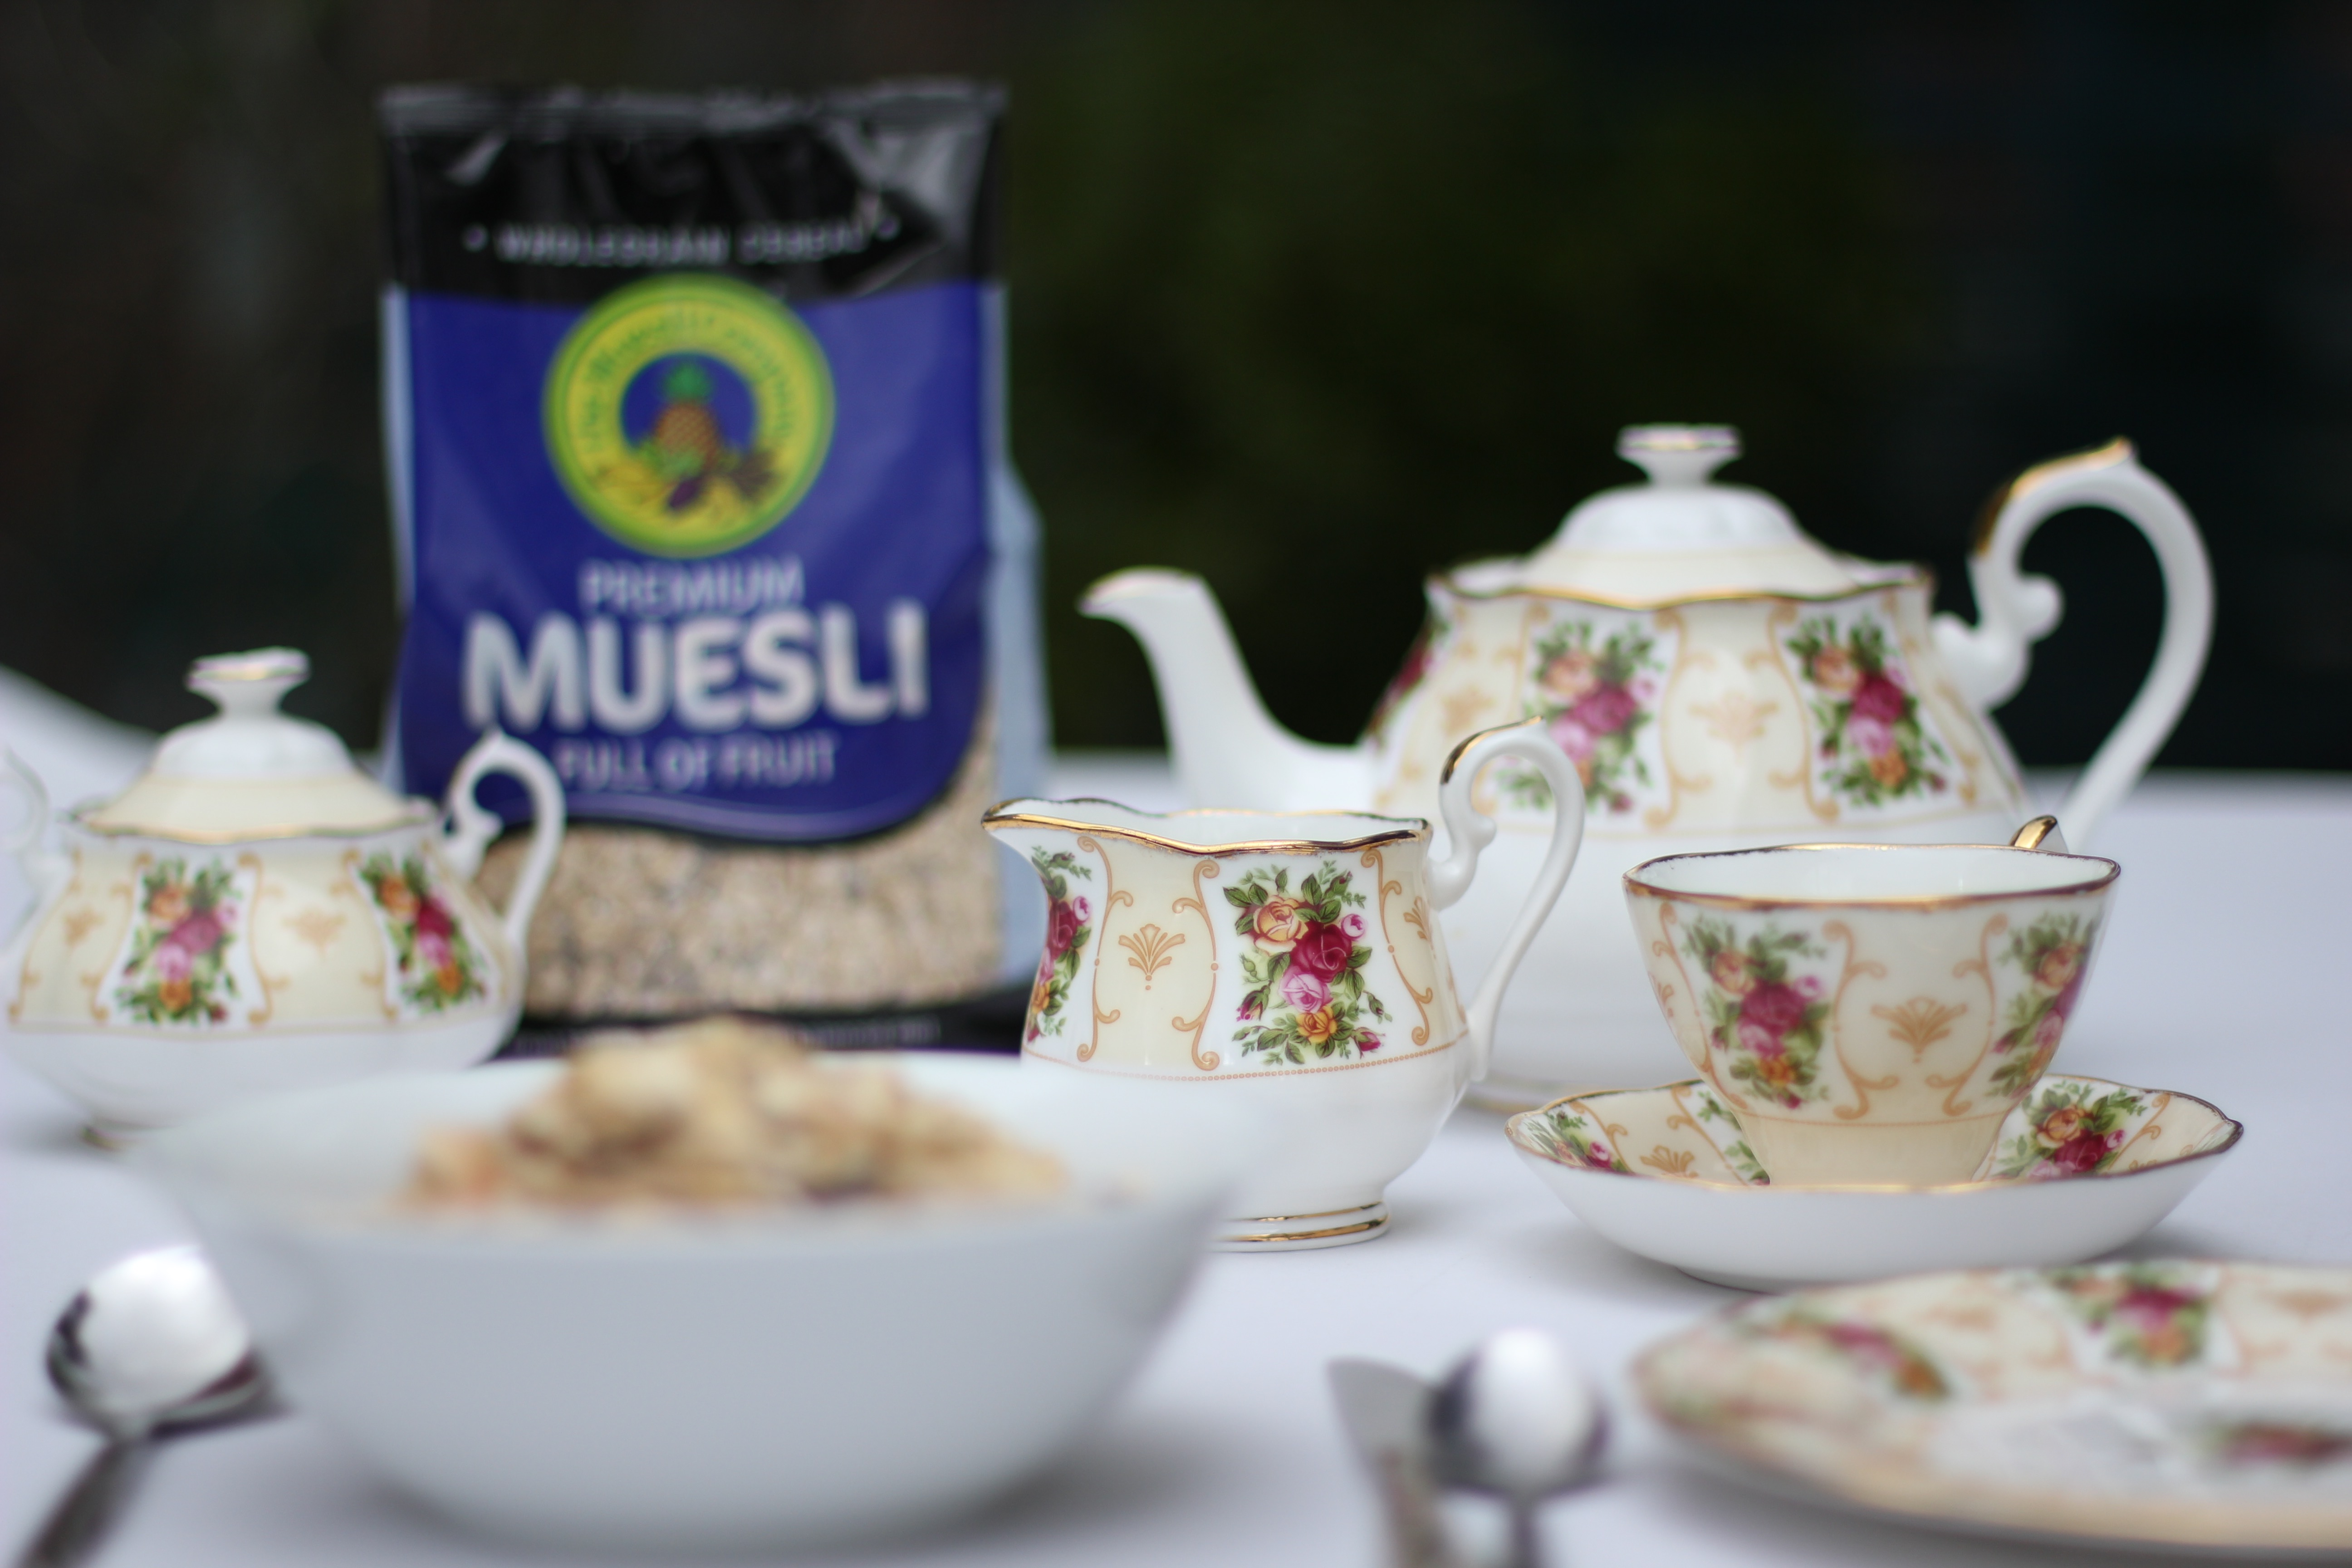 The Muesli Company